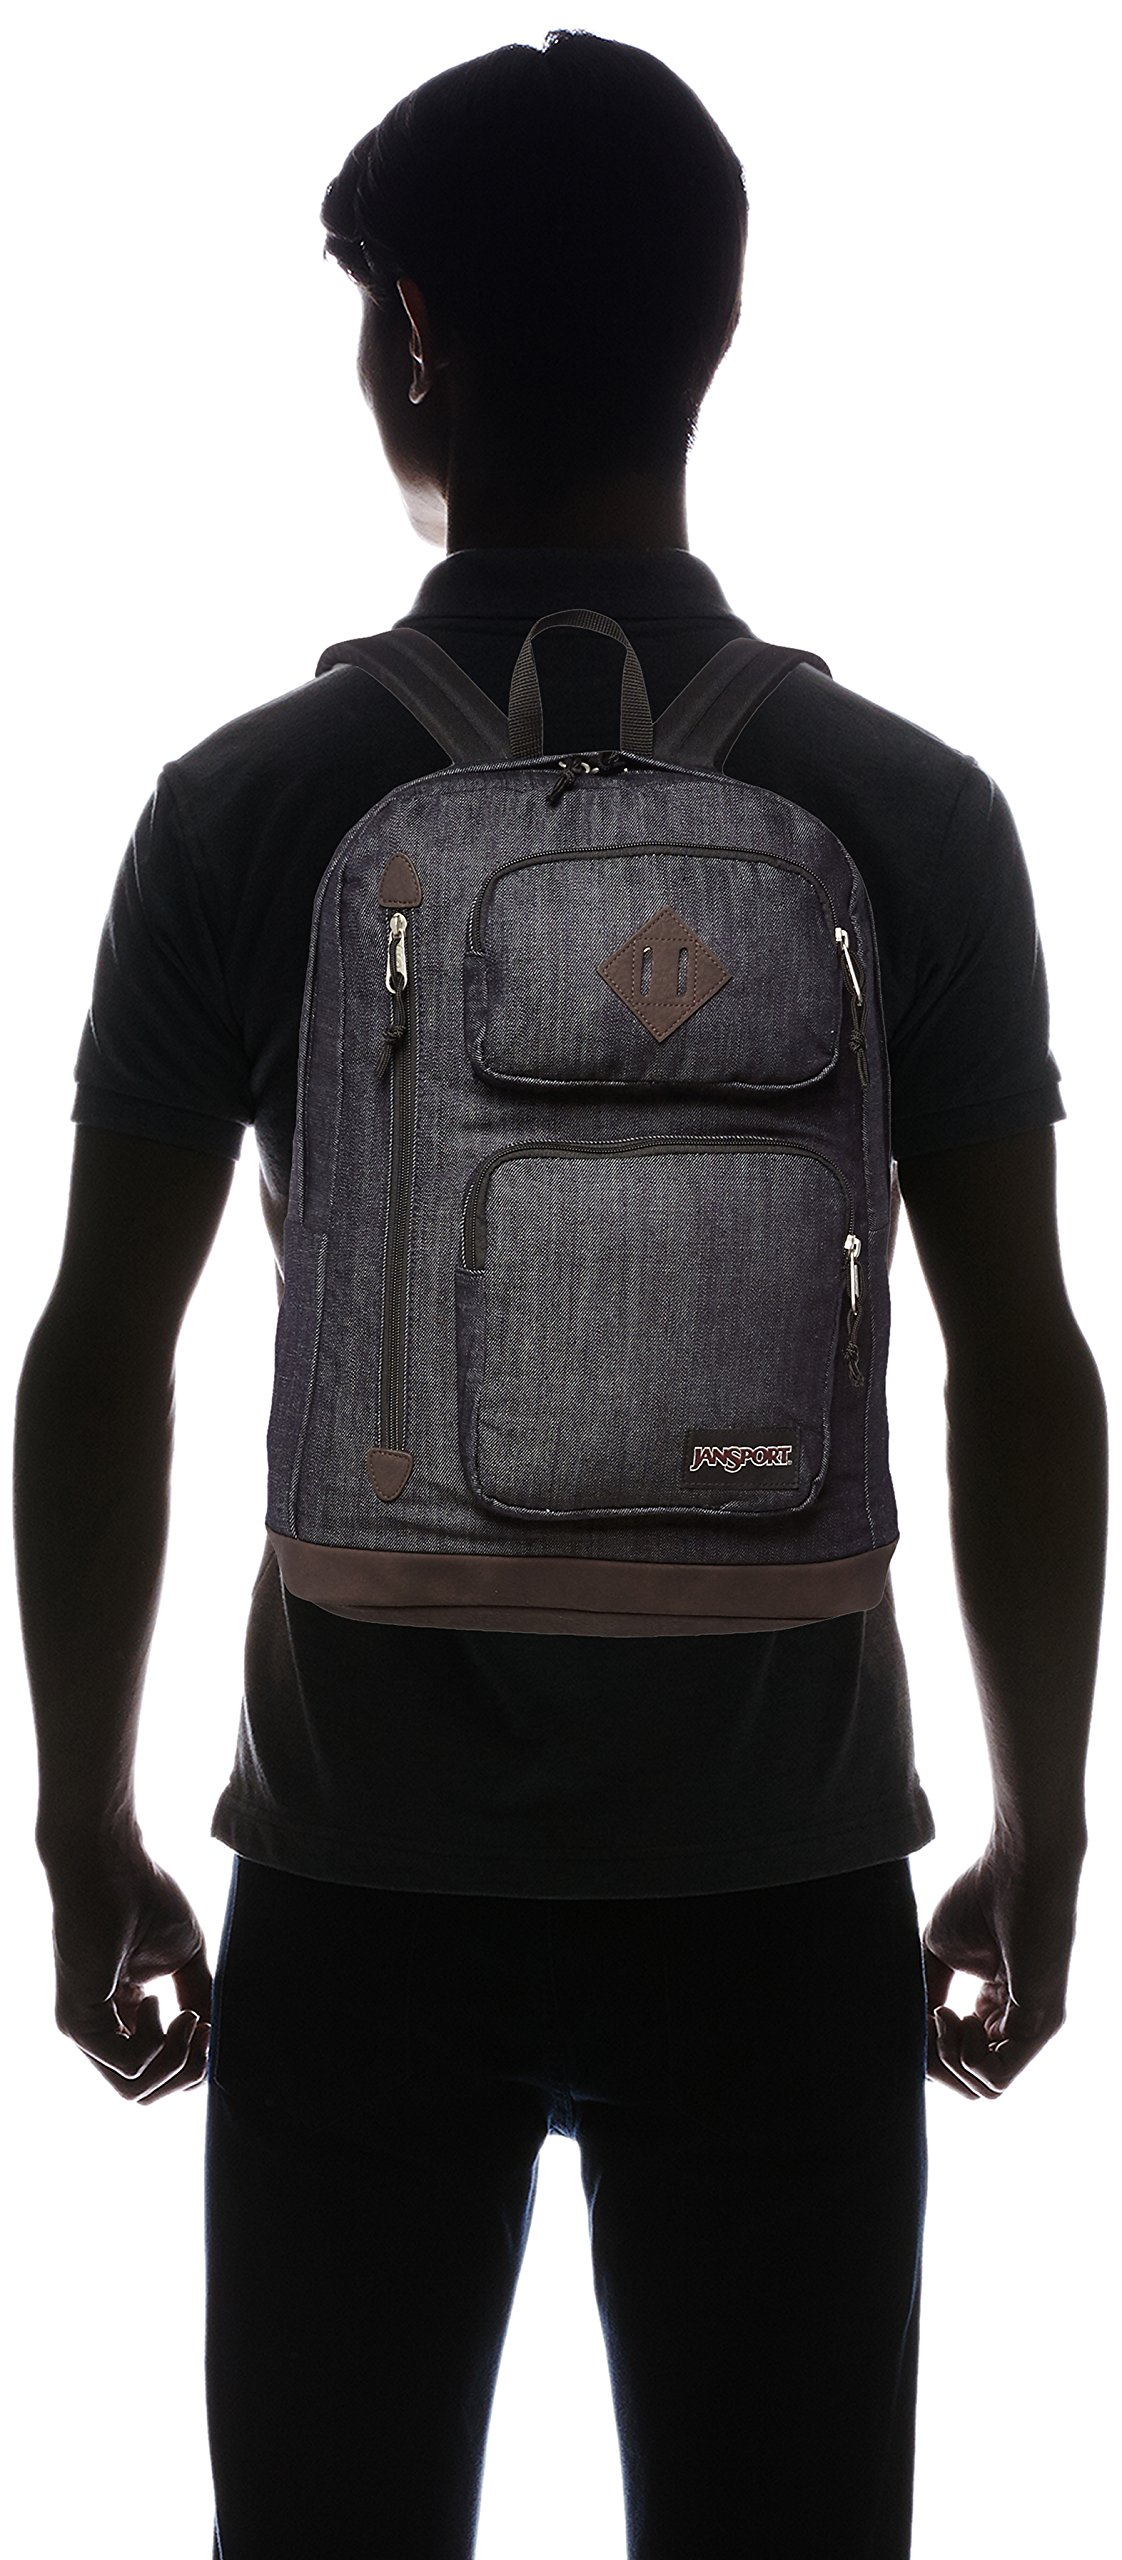 JanSport Houston Laptop Backpack- Discontinued Colors (Blue Denim - Expressions) by JanSport (Image #4)